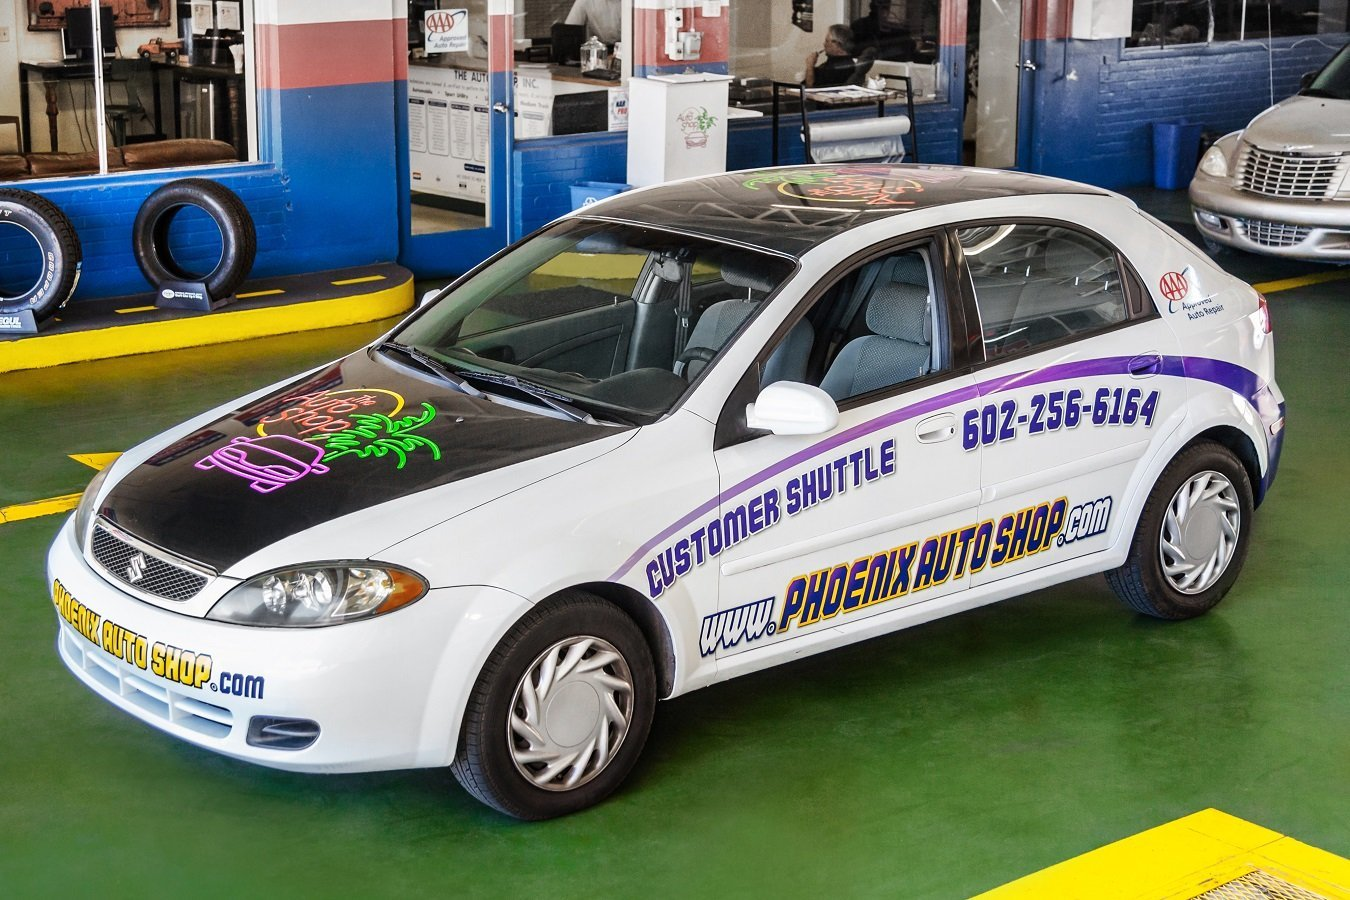 Electrical Specialty Car Repair Shop